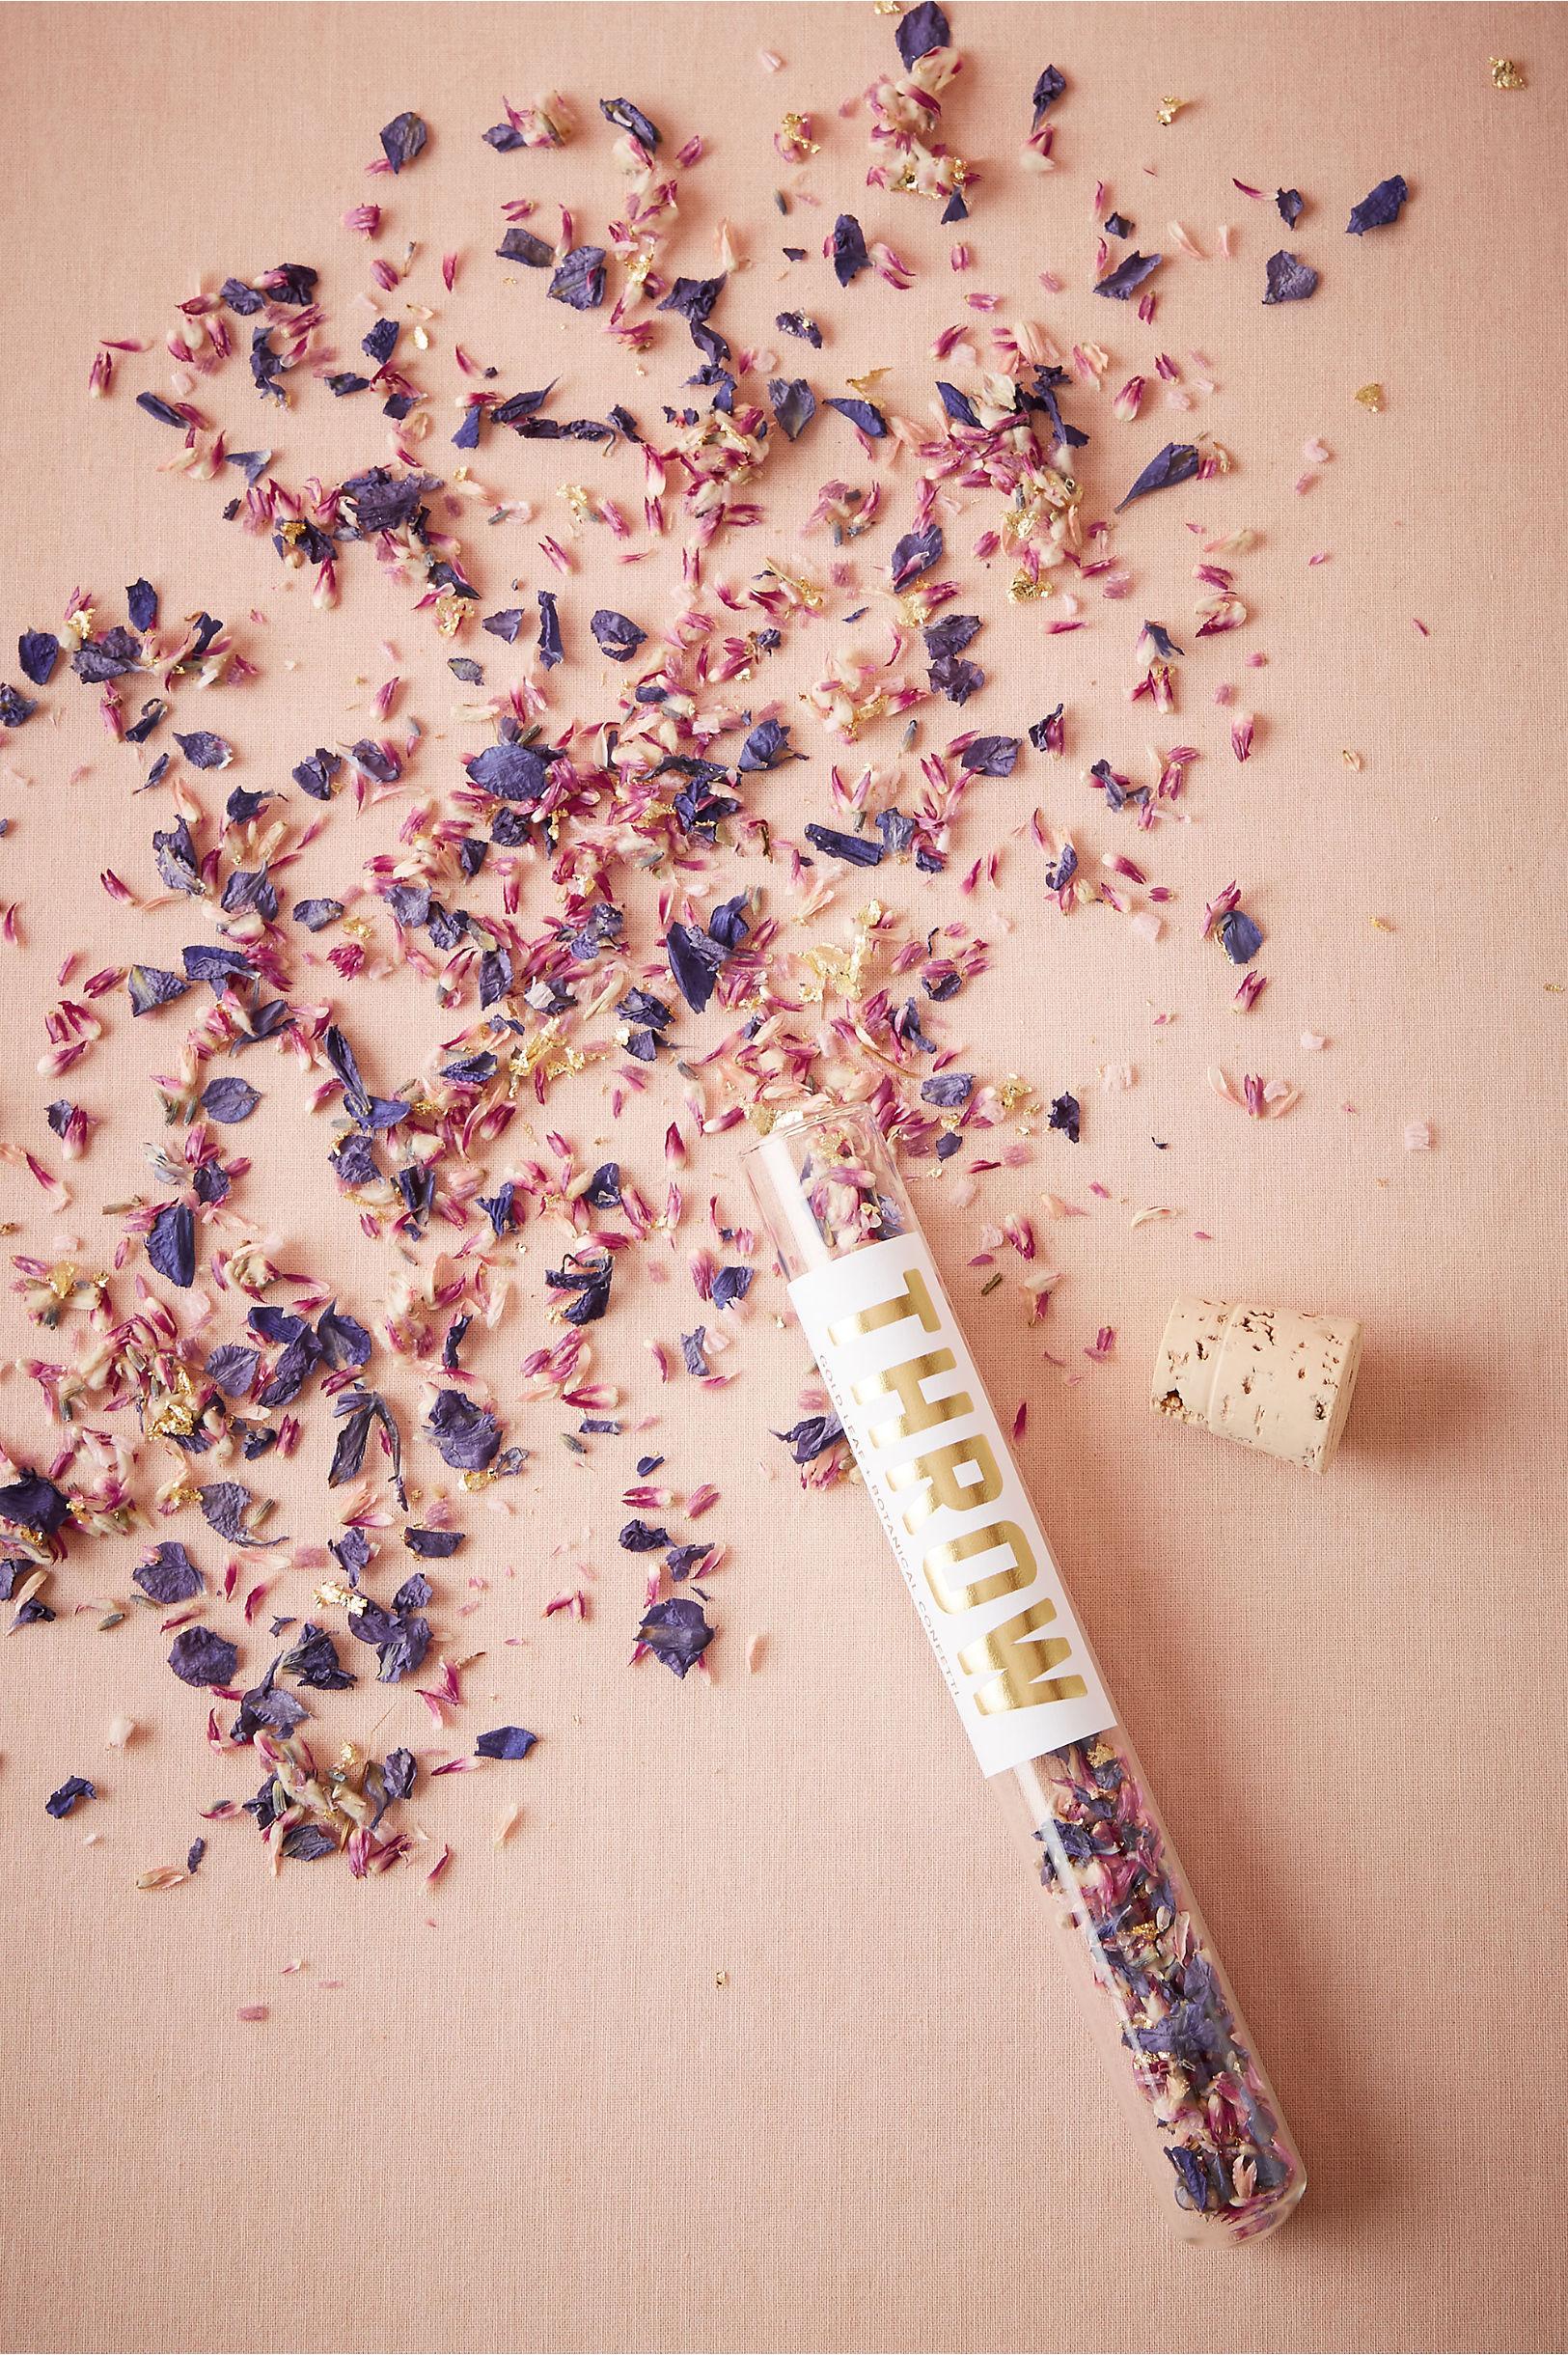 Eco-Friendly Floral Confetti in Sale | BHLDN